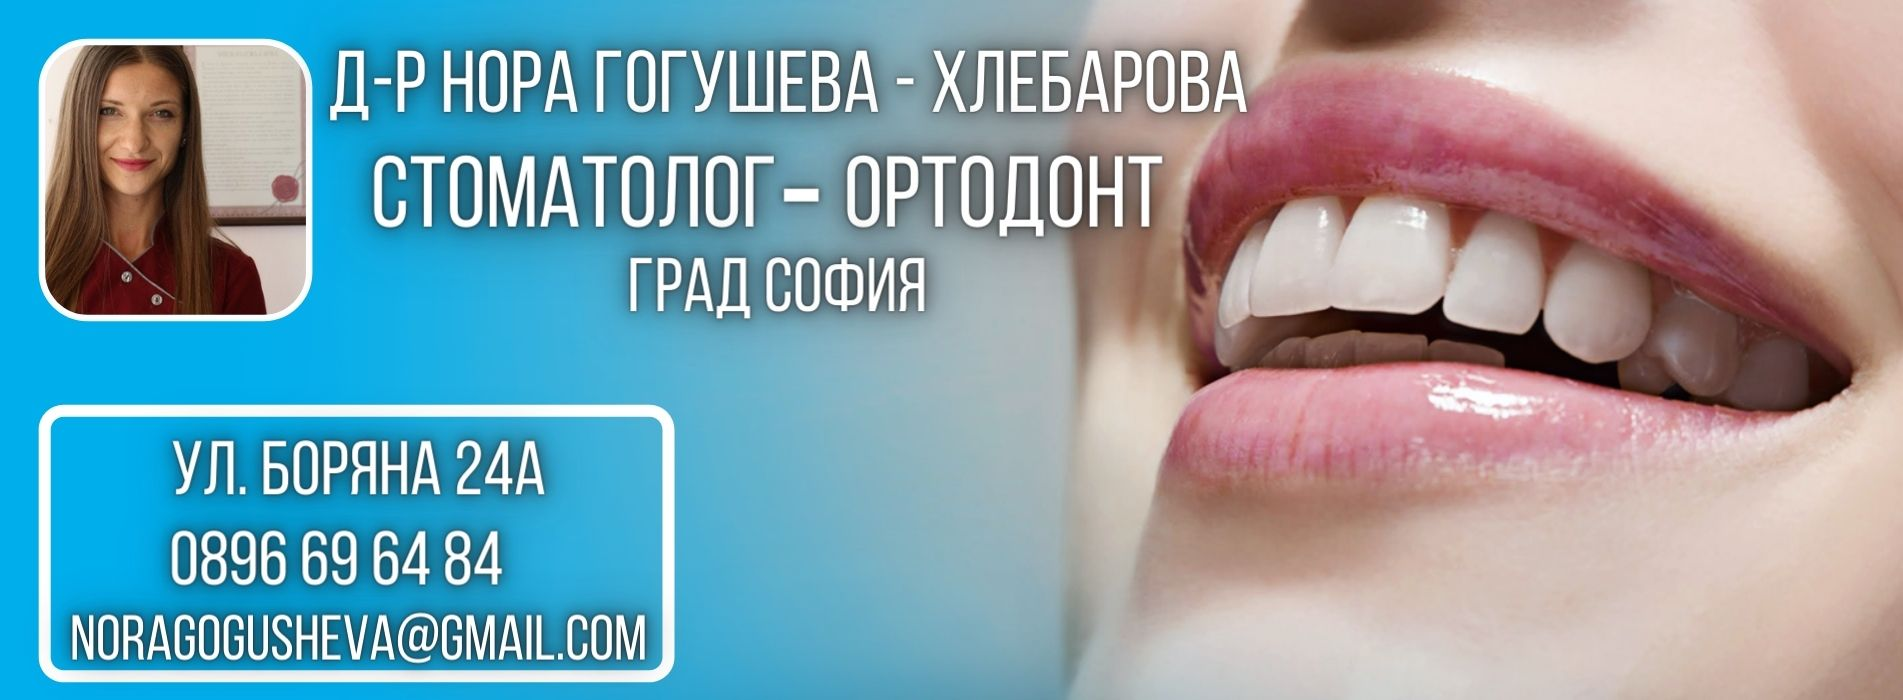 Нора Гогушева - стоматолог софия, добър стоматолог софия